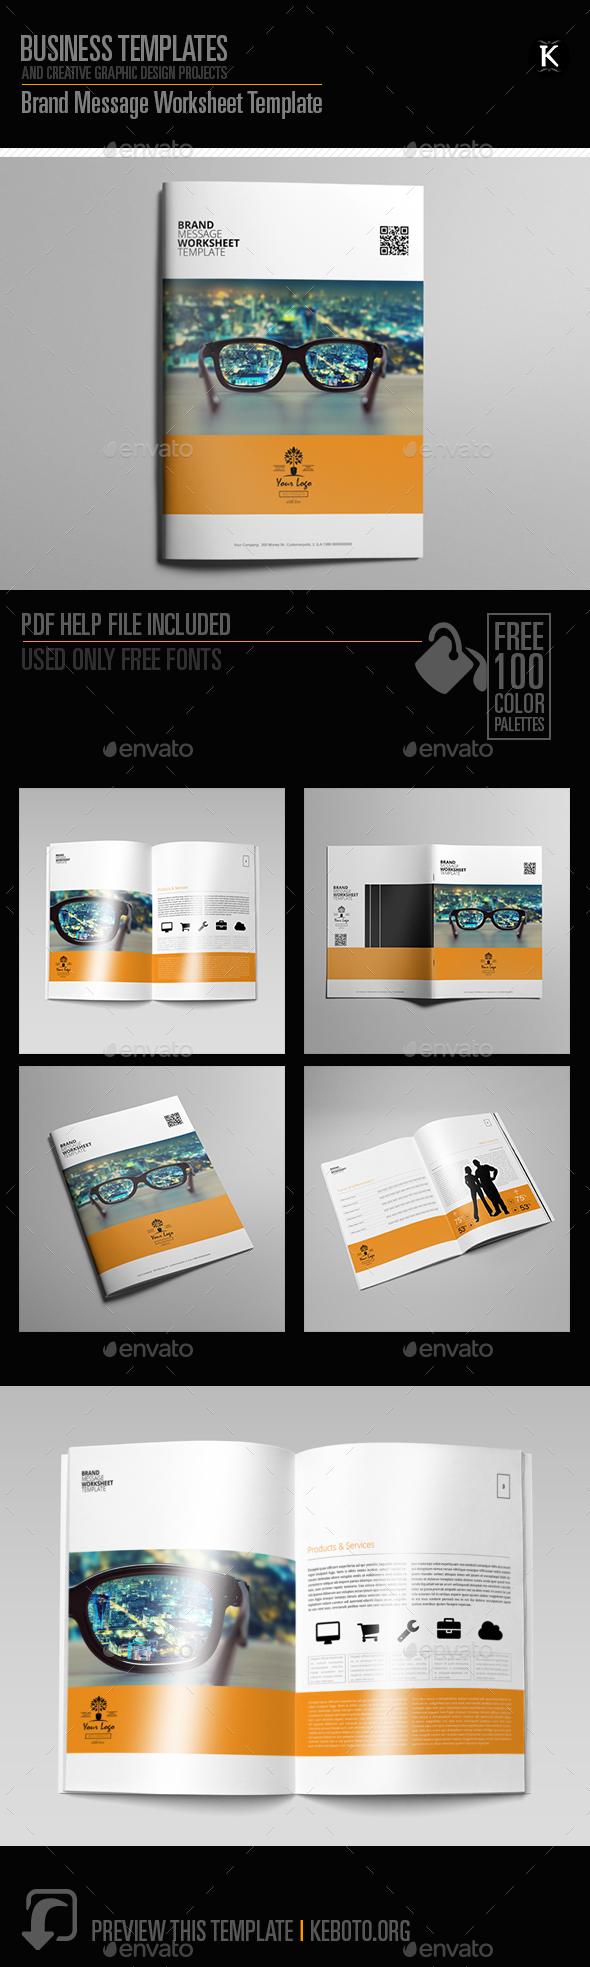 Worksheet Template Graphics, Designs & Templates